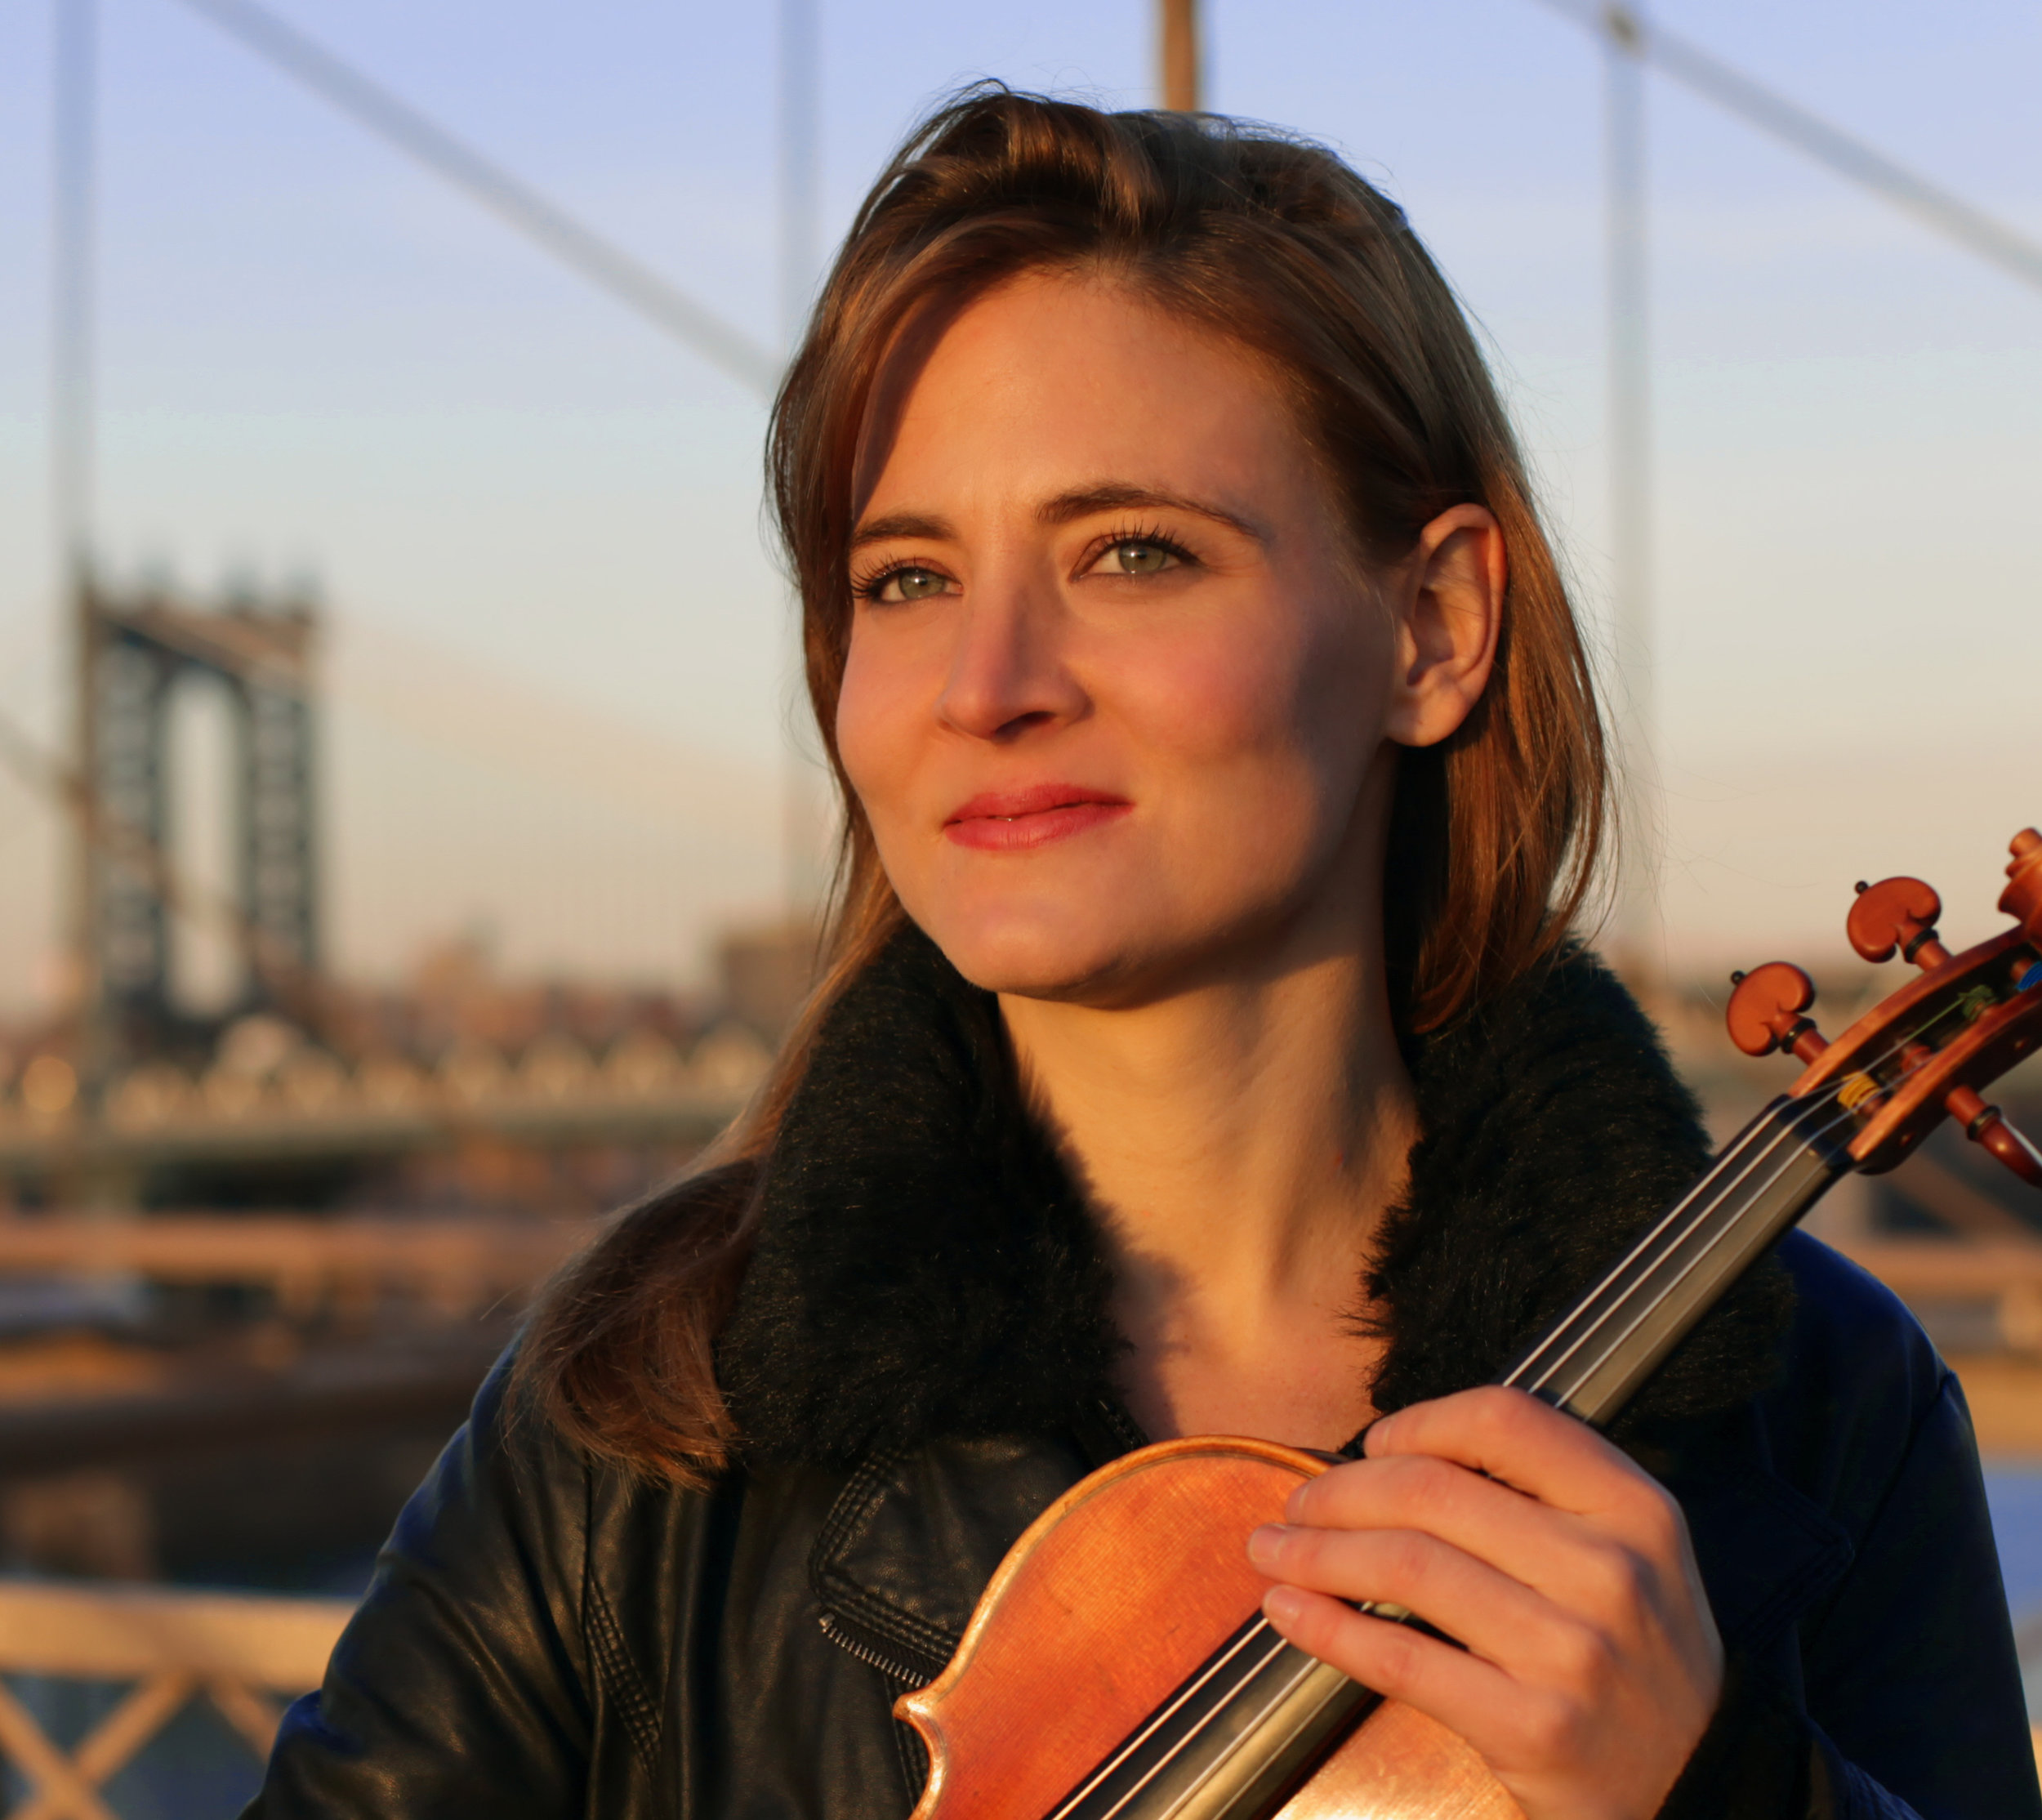 ElissaCassini-ManhattanShot.jpg